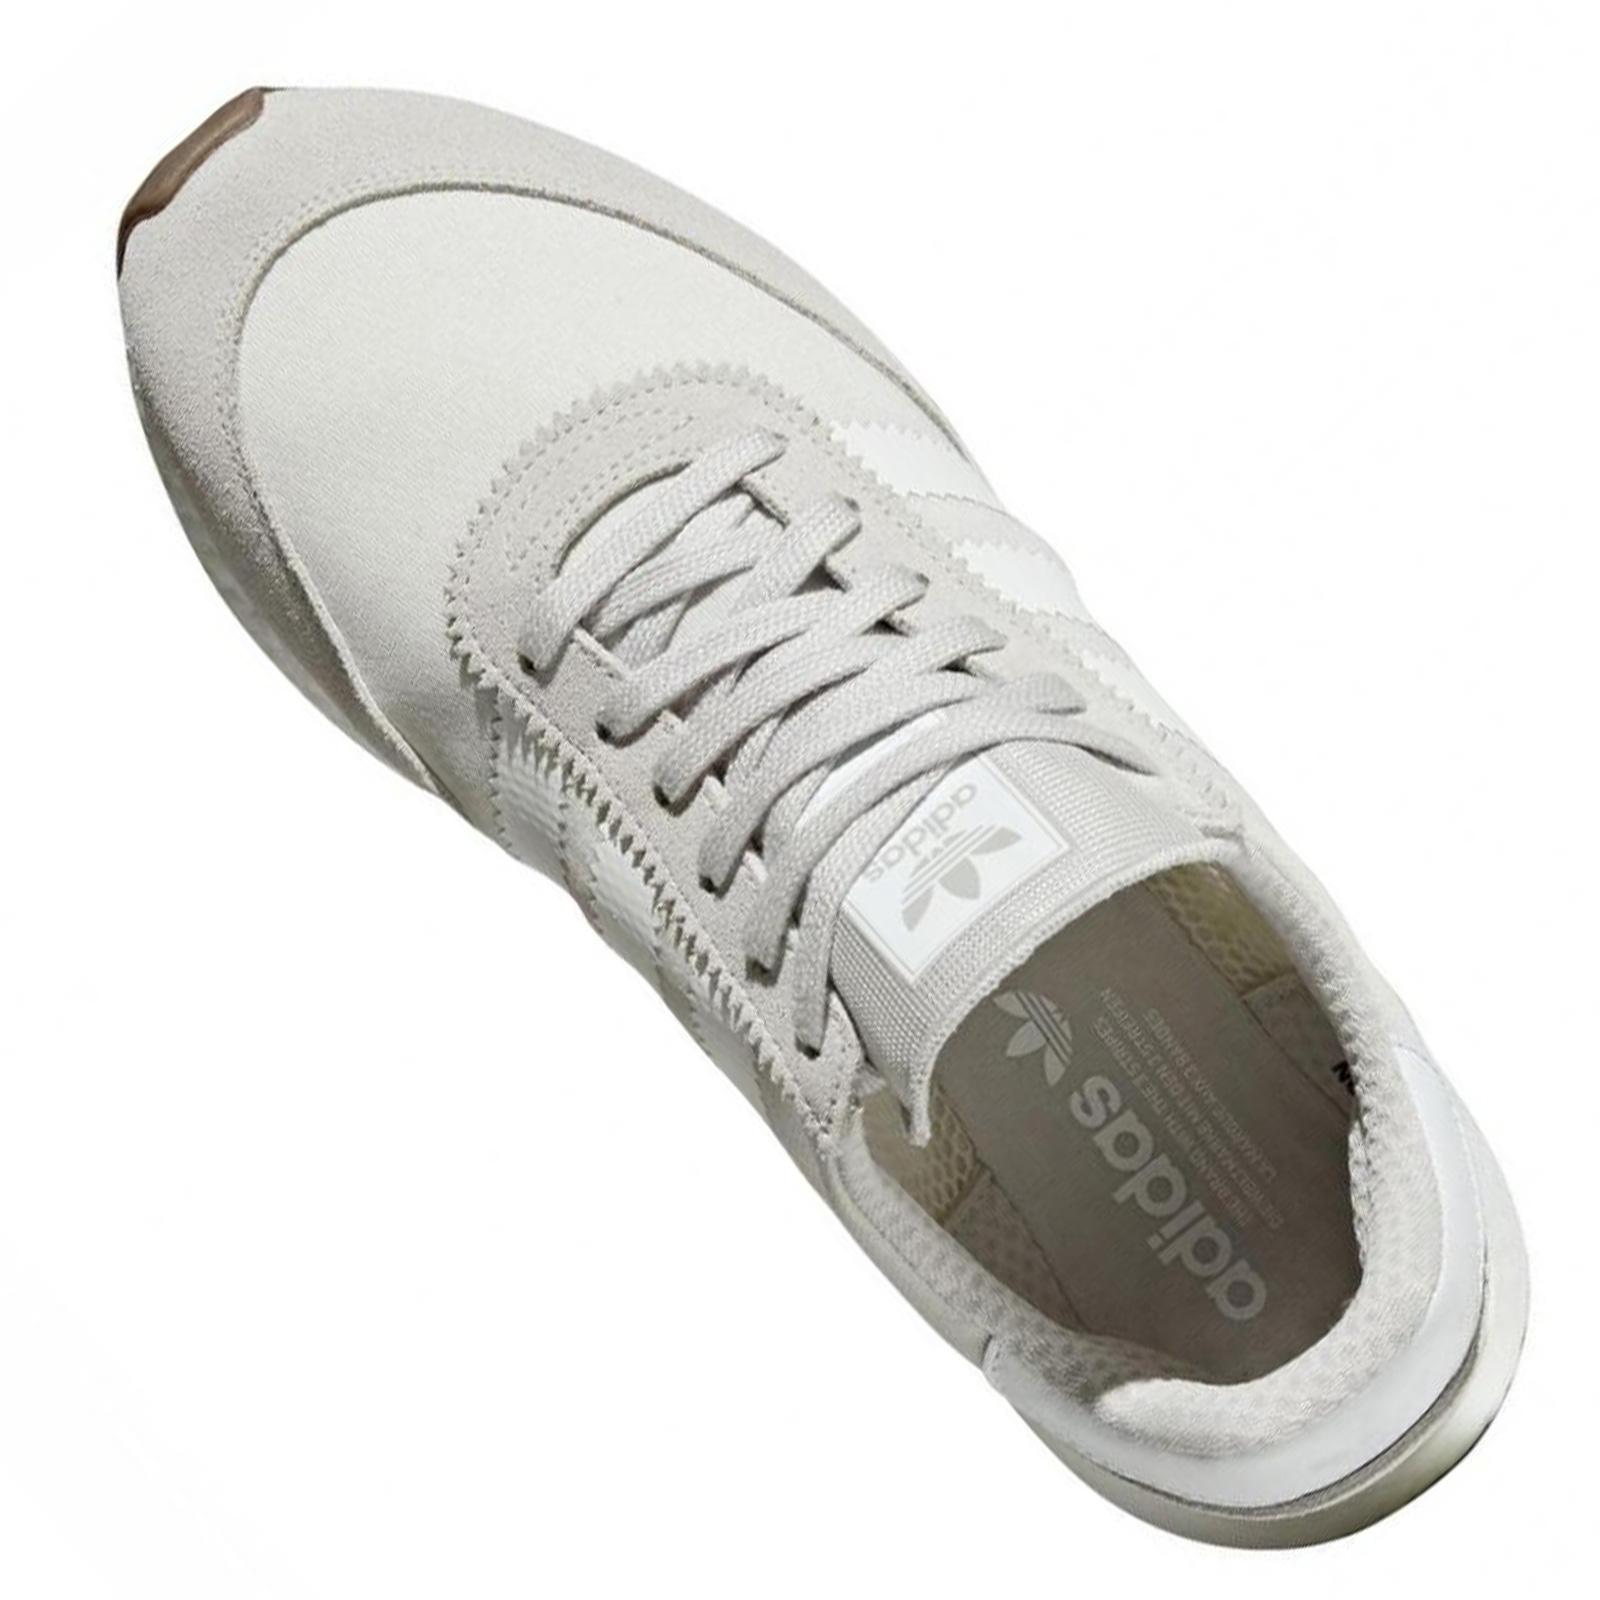 adidas sneakers Origininals I 5923 Iniki Runner Herren Sneaker Schuhe Grau